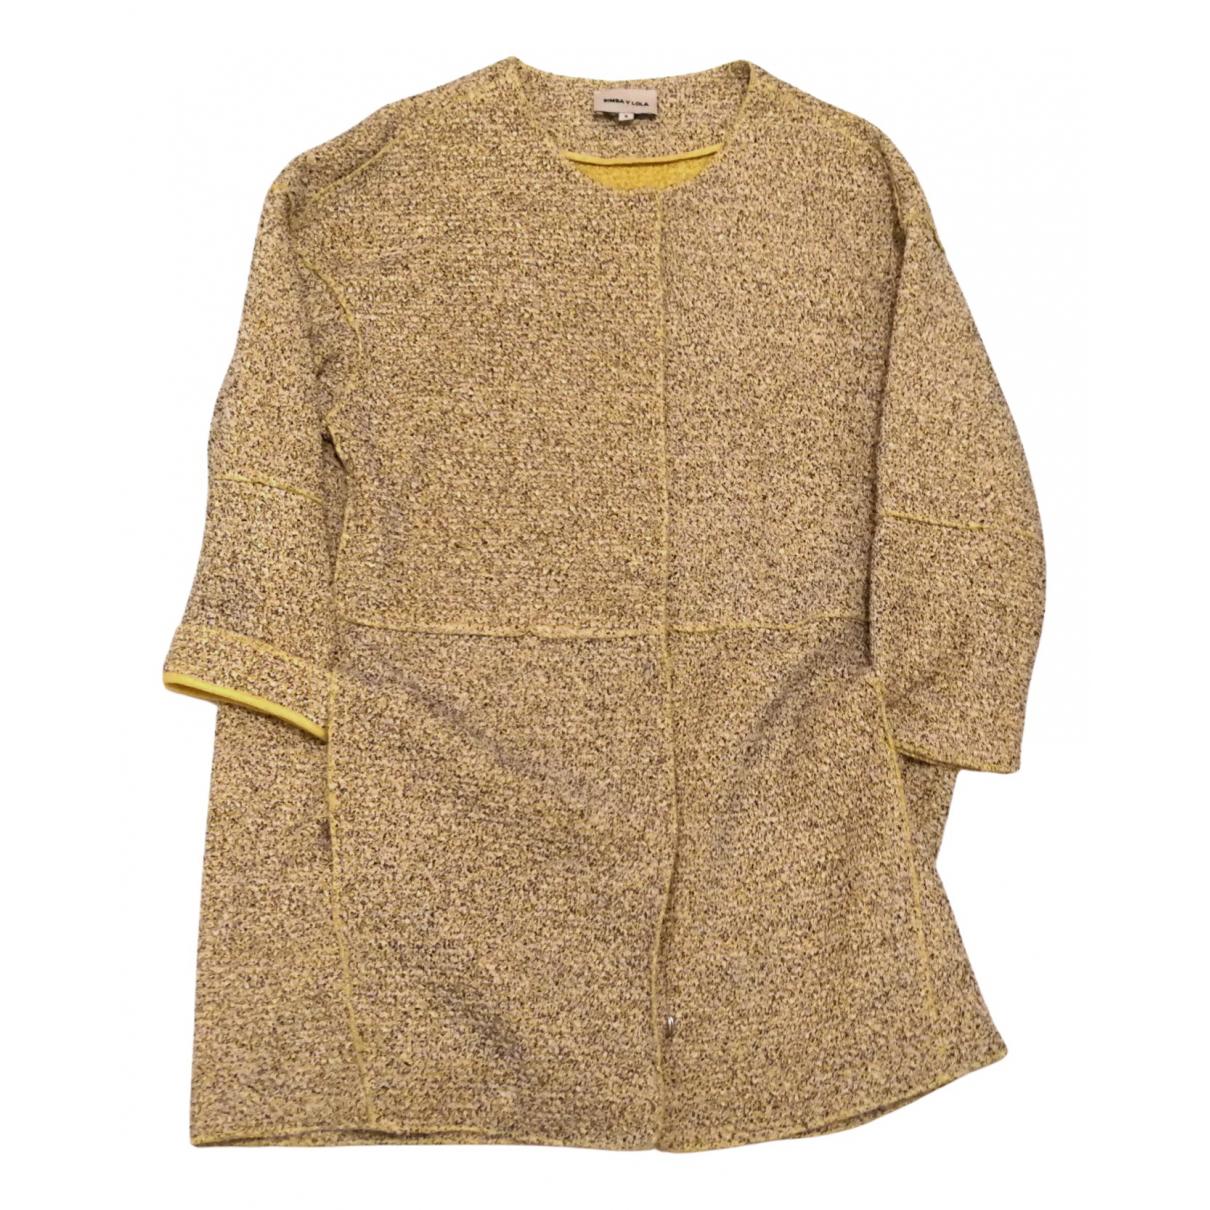 Bimba Y Lola \N Yellow Cotton coat for Women S International